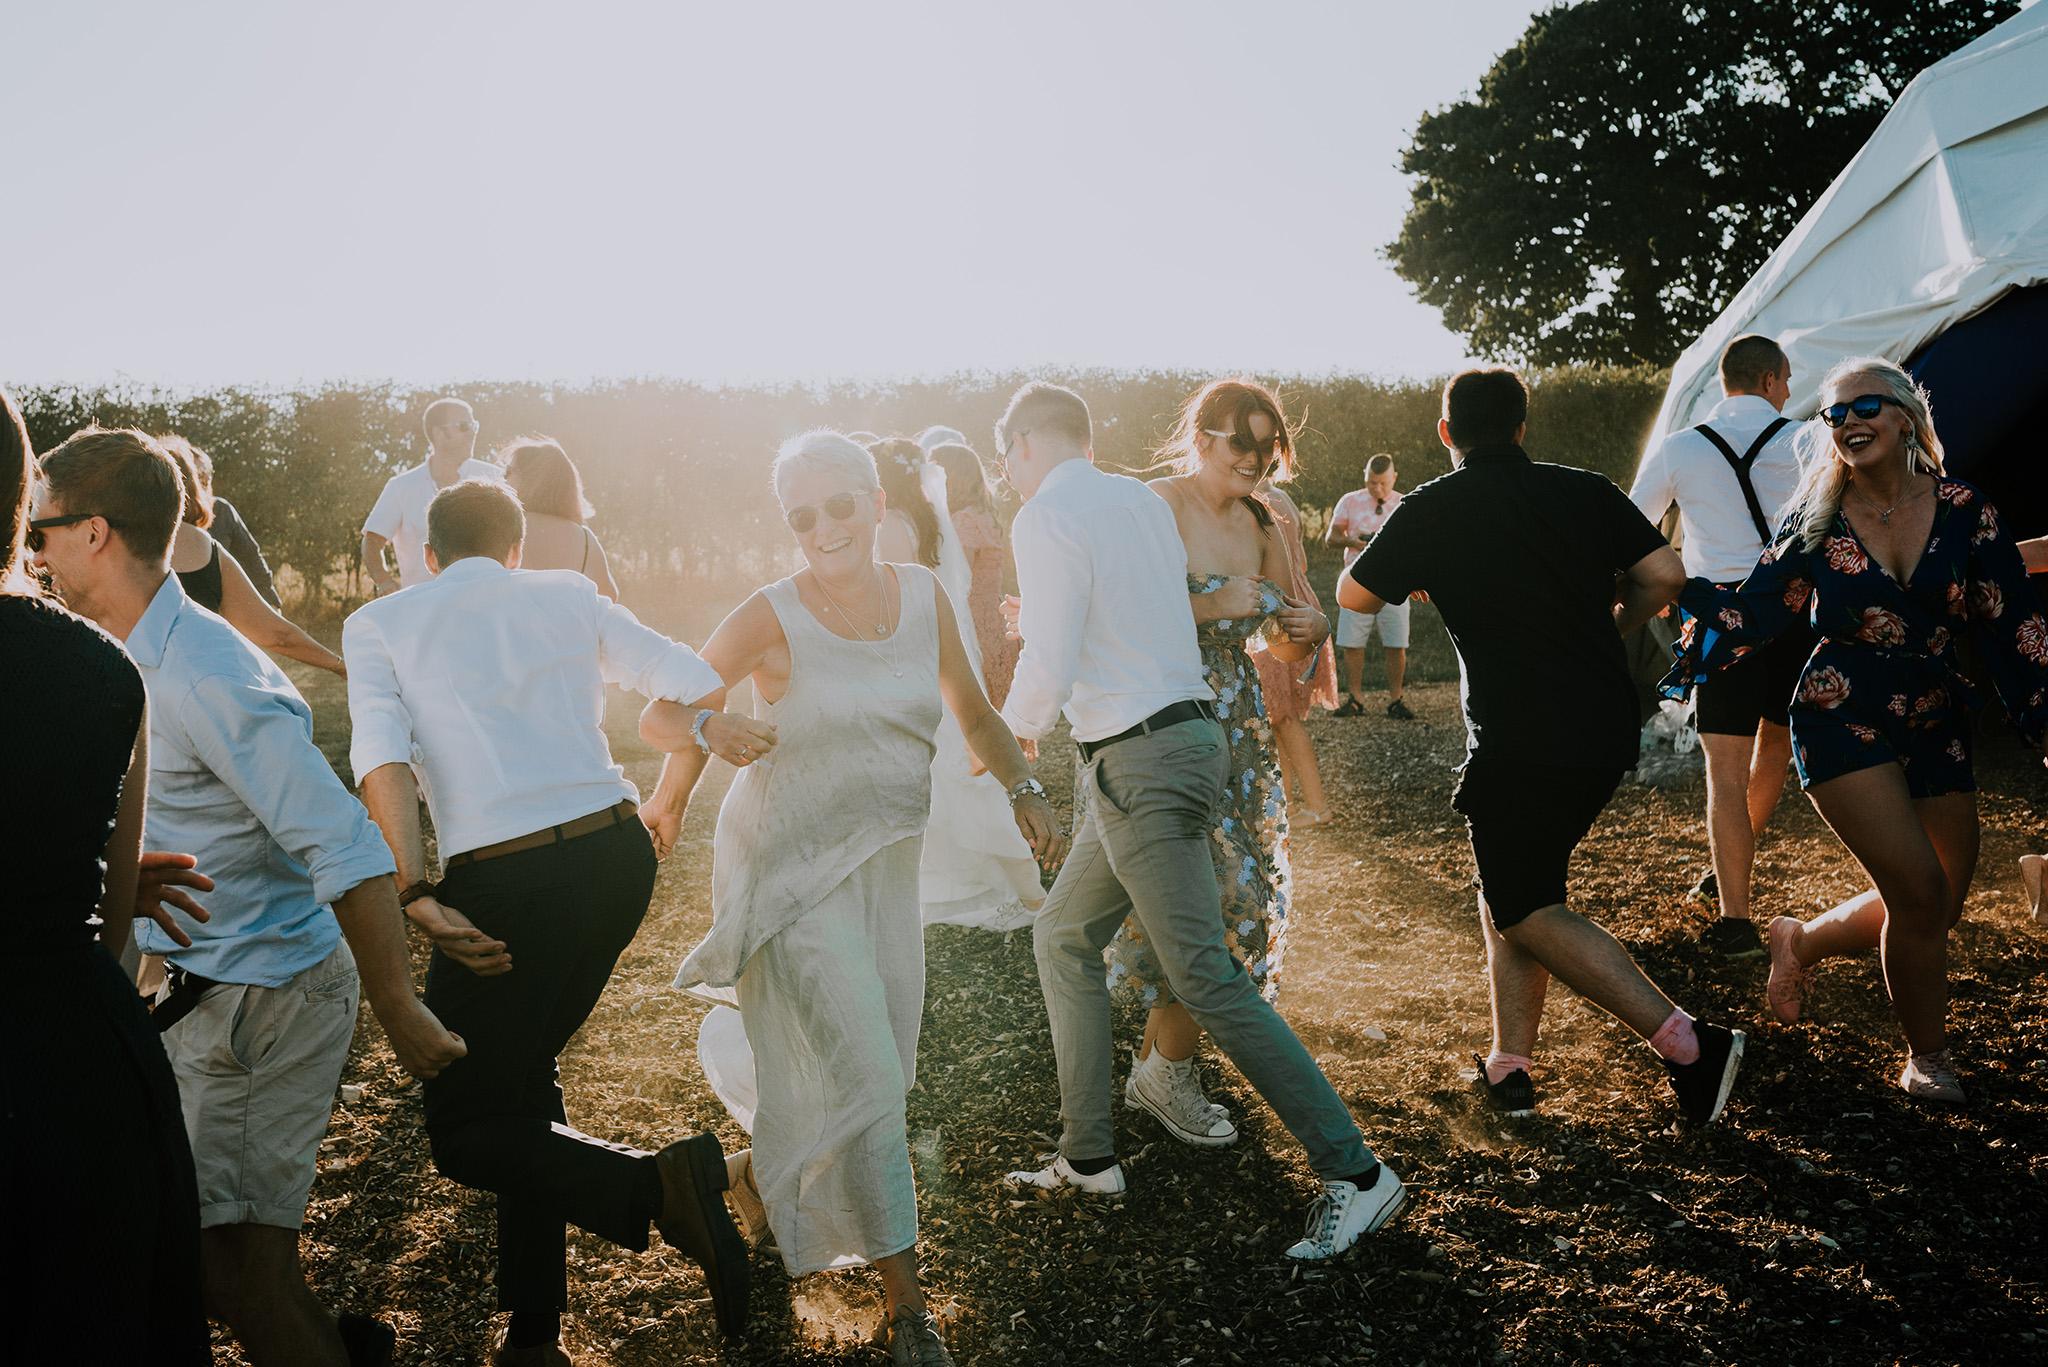 scott-stockwell-photography-wedding-28.jpg